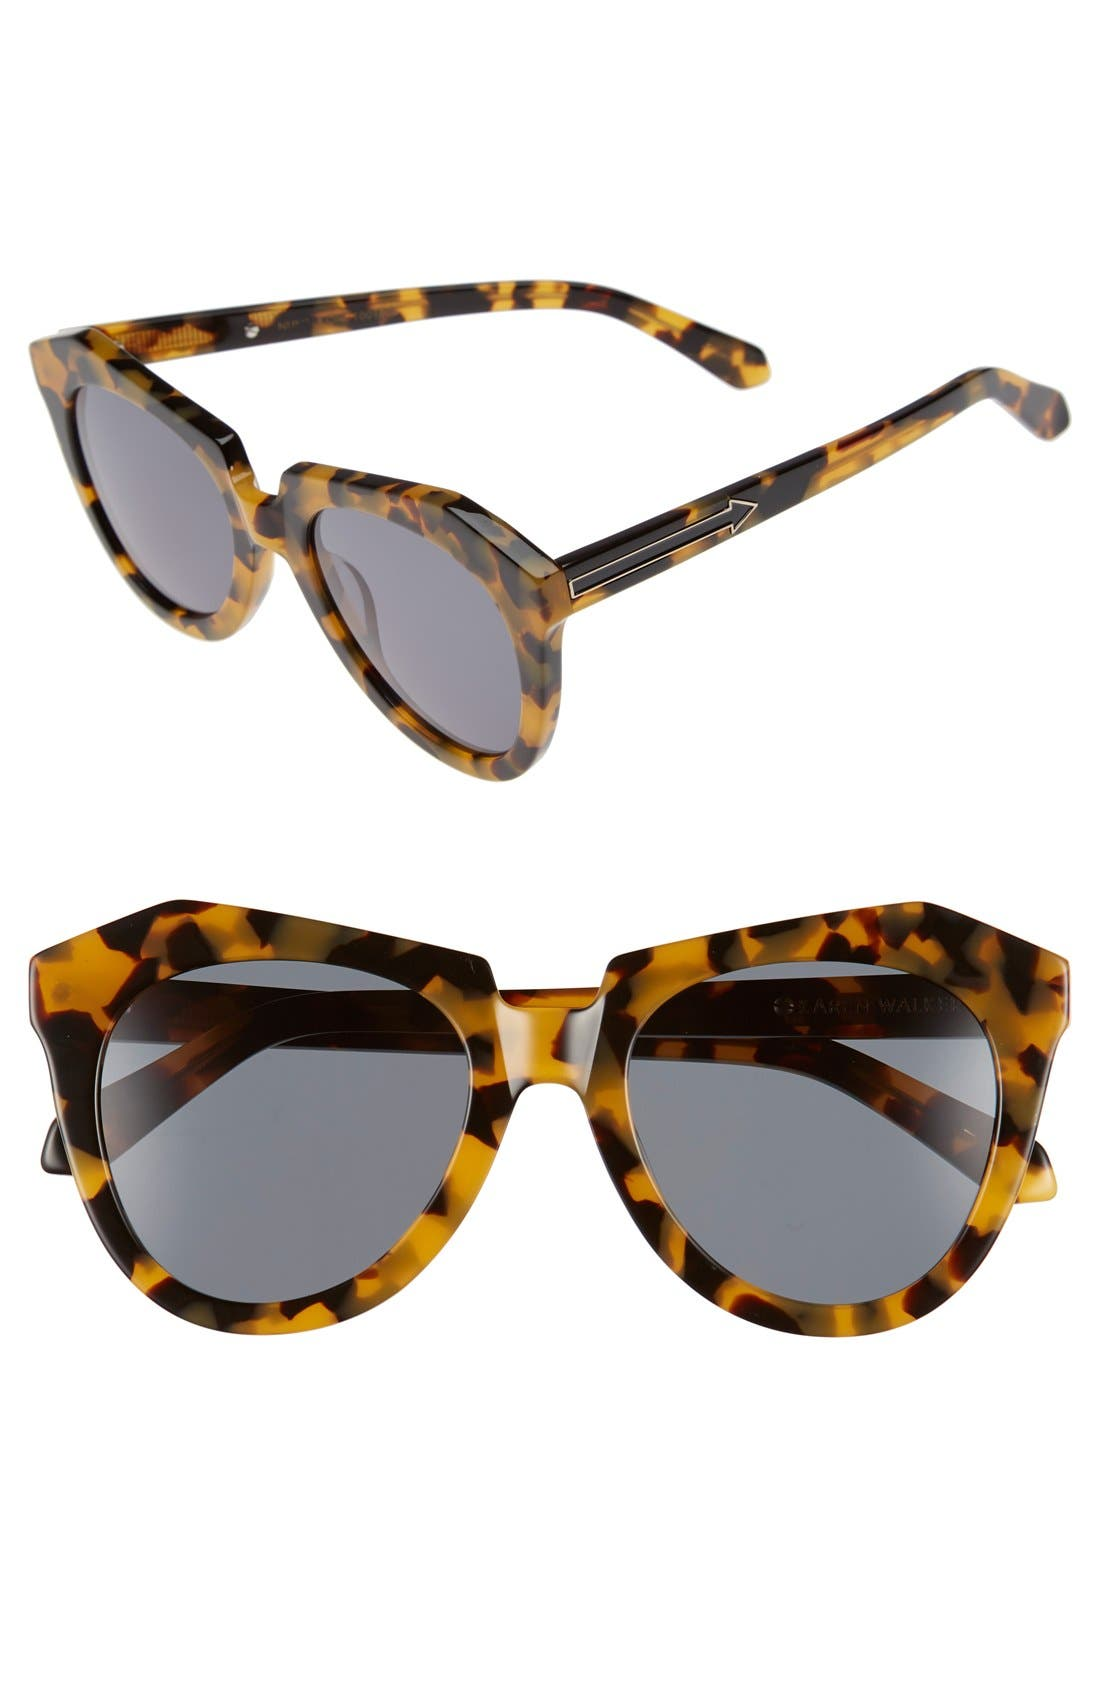 Alternate Image 1 Selected - Karen Walker 'Number One' 50mm Sunglasses